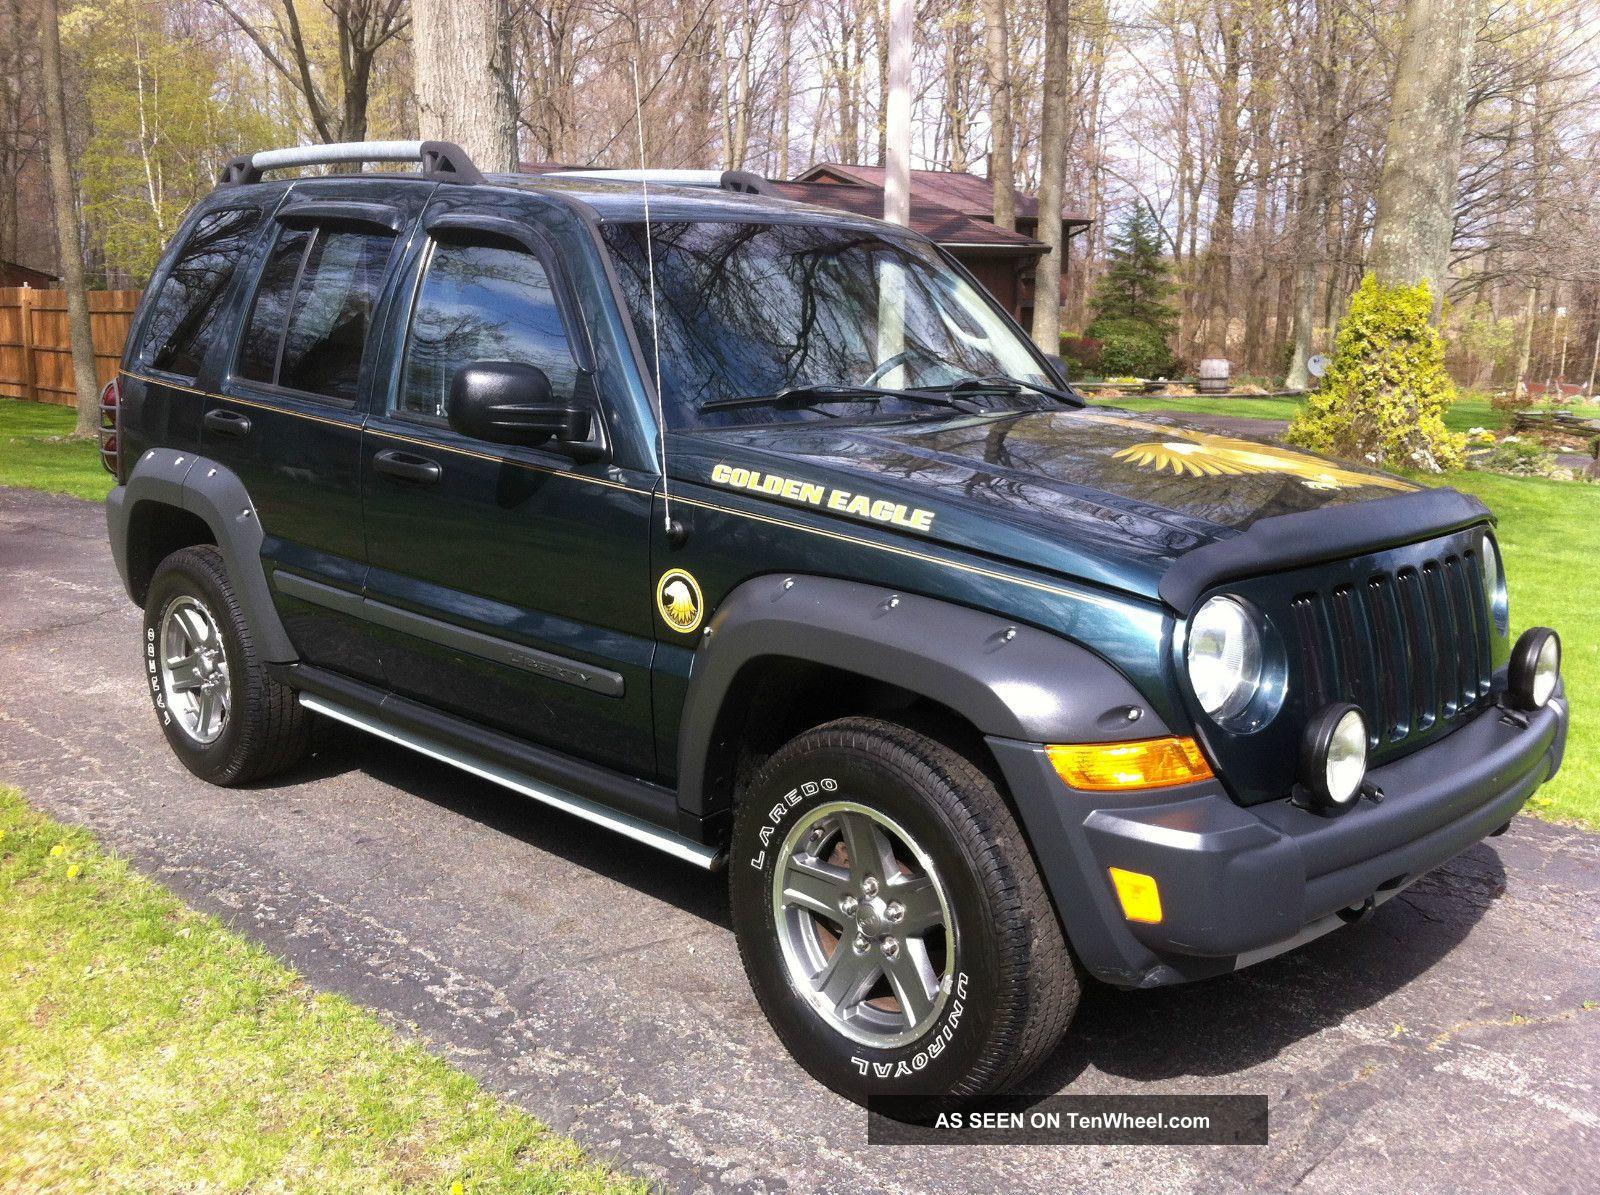 2005 Jeep Liberty Renegade Sport Utility 4 Door 3 7l